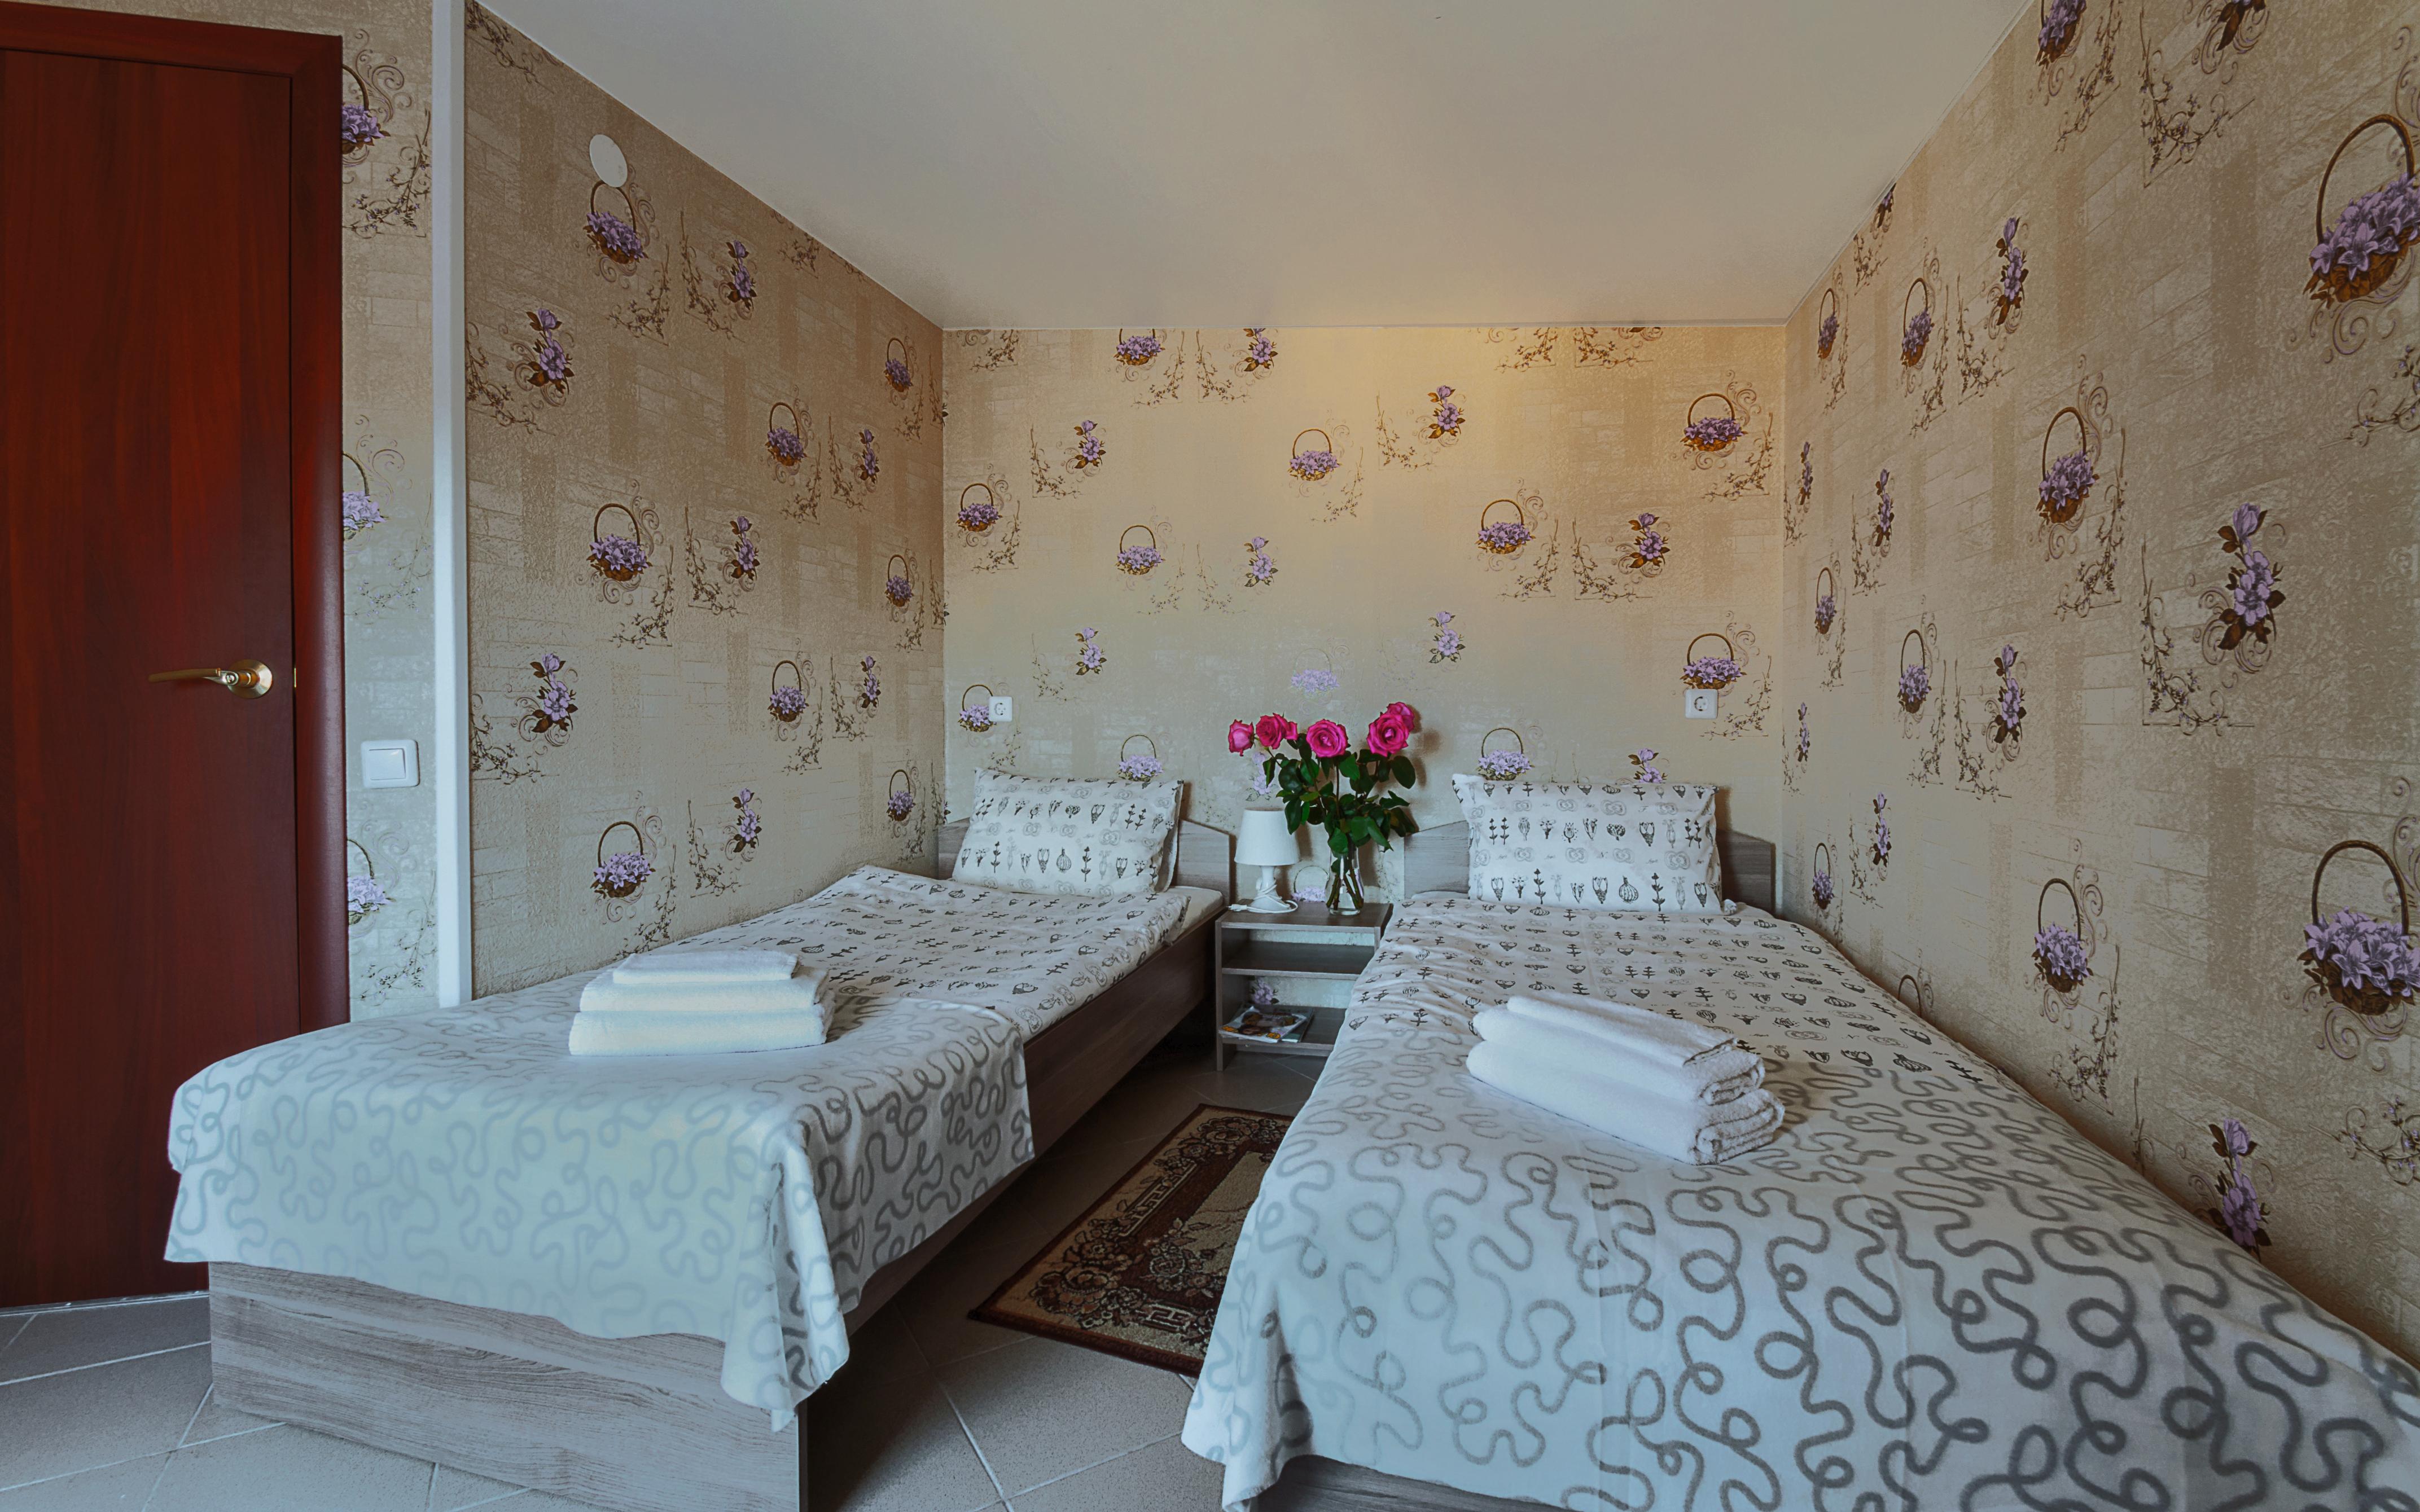 http://megapolis-hotel.ru/wp-content/uploads/2016/08/DSC_5457.jpg